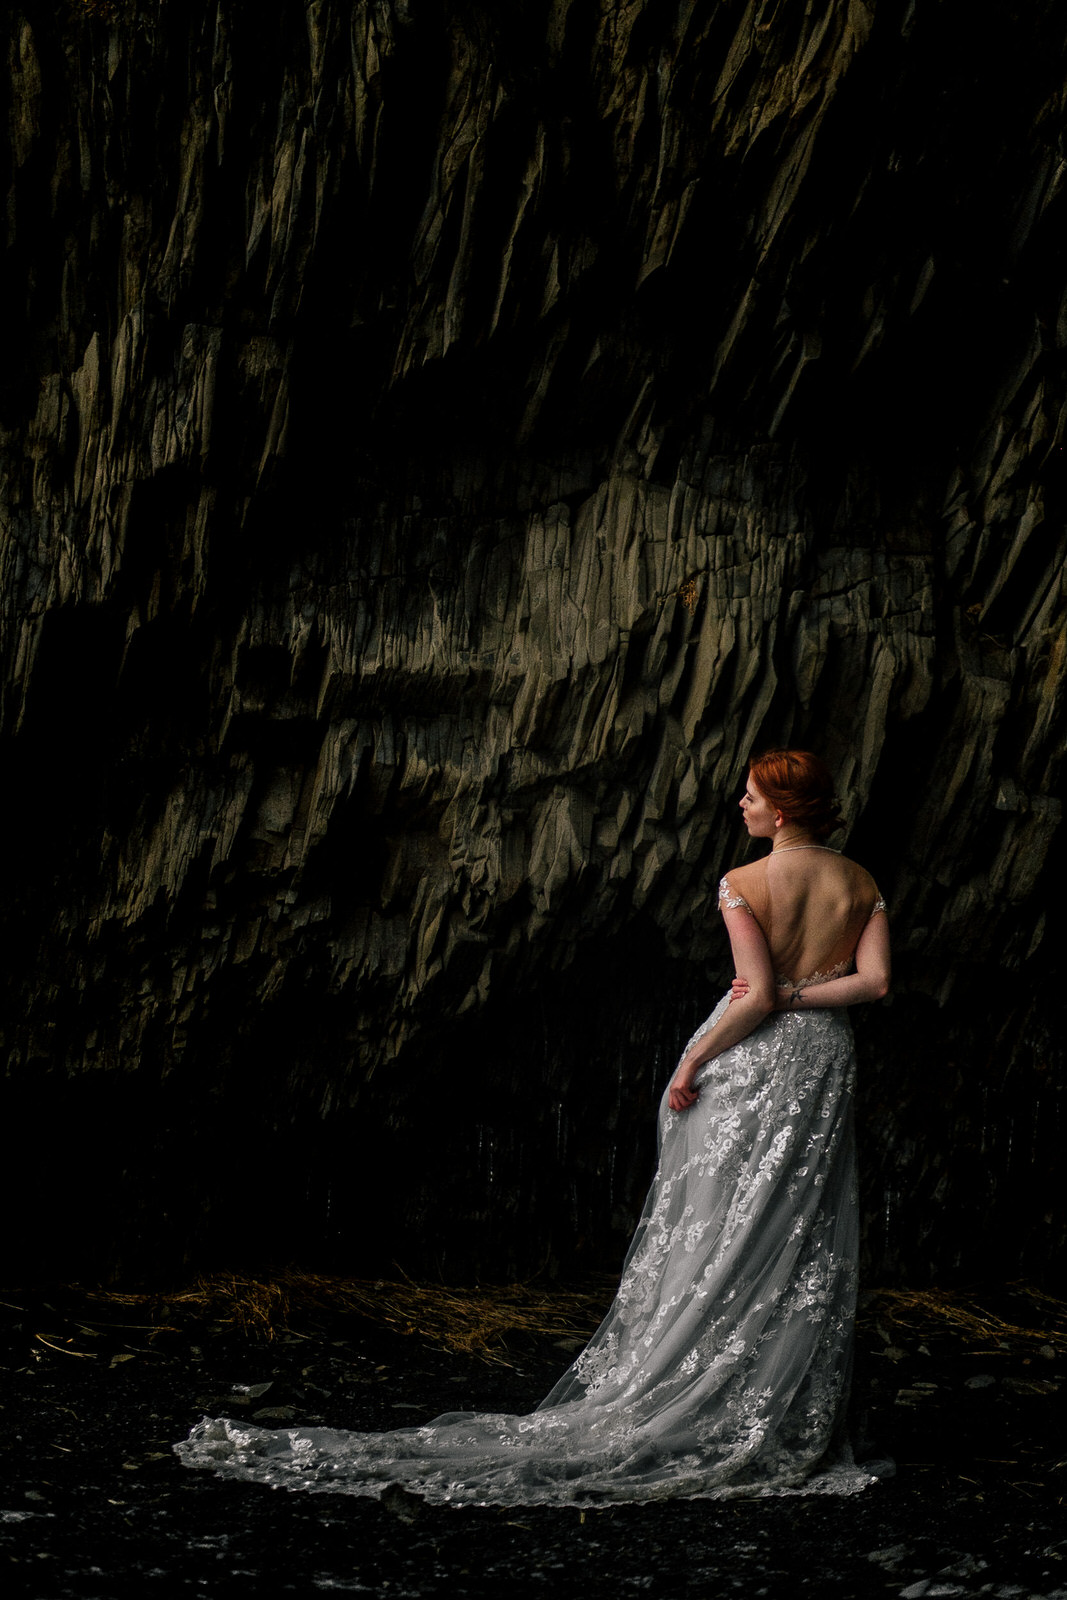 Collective_Wander_Iceland_Photographers_Trip_058.jpg